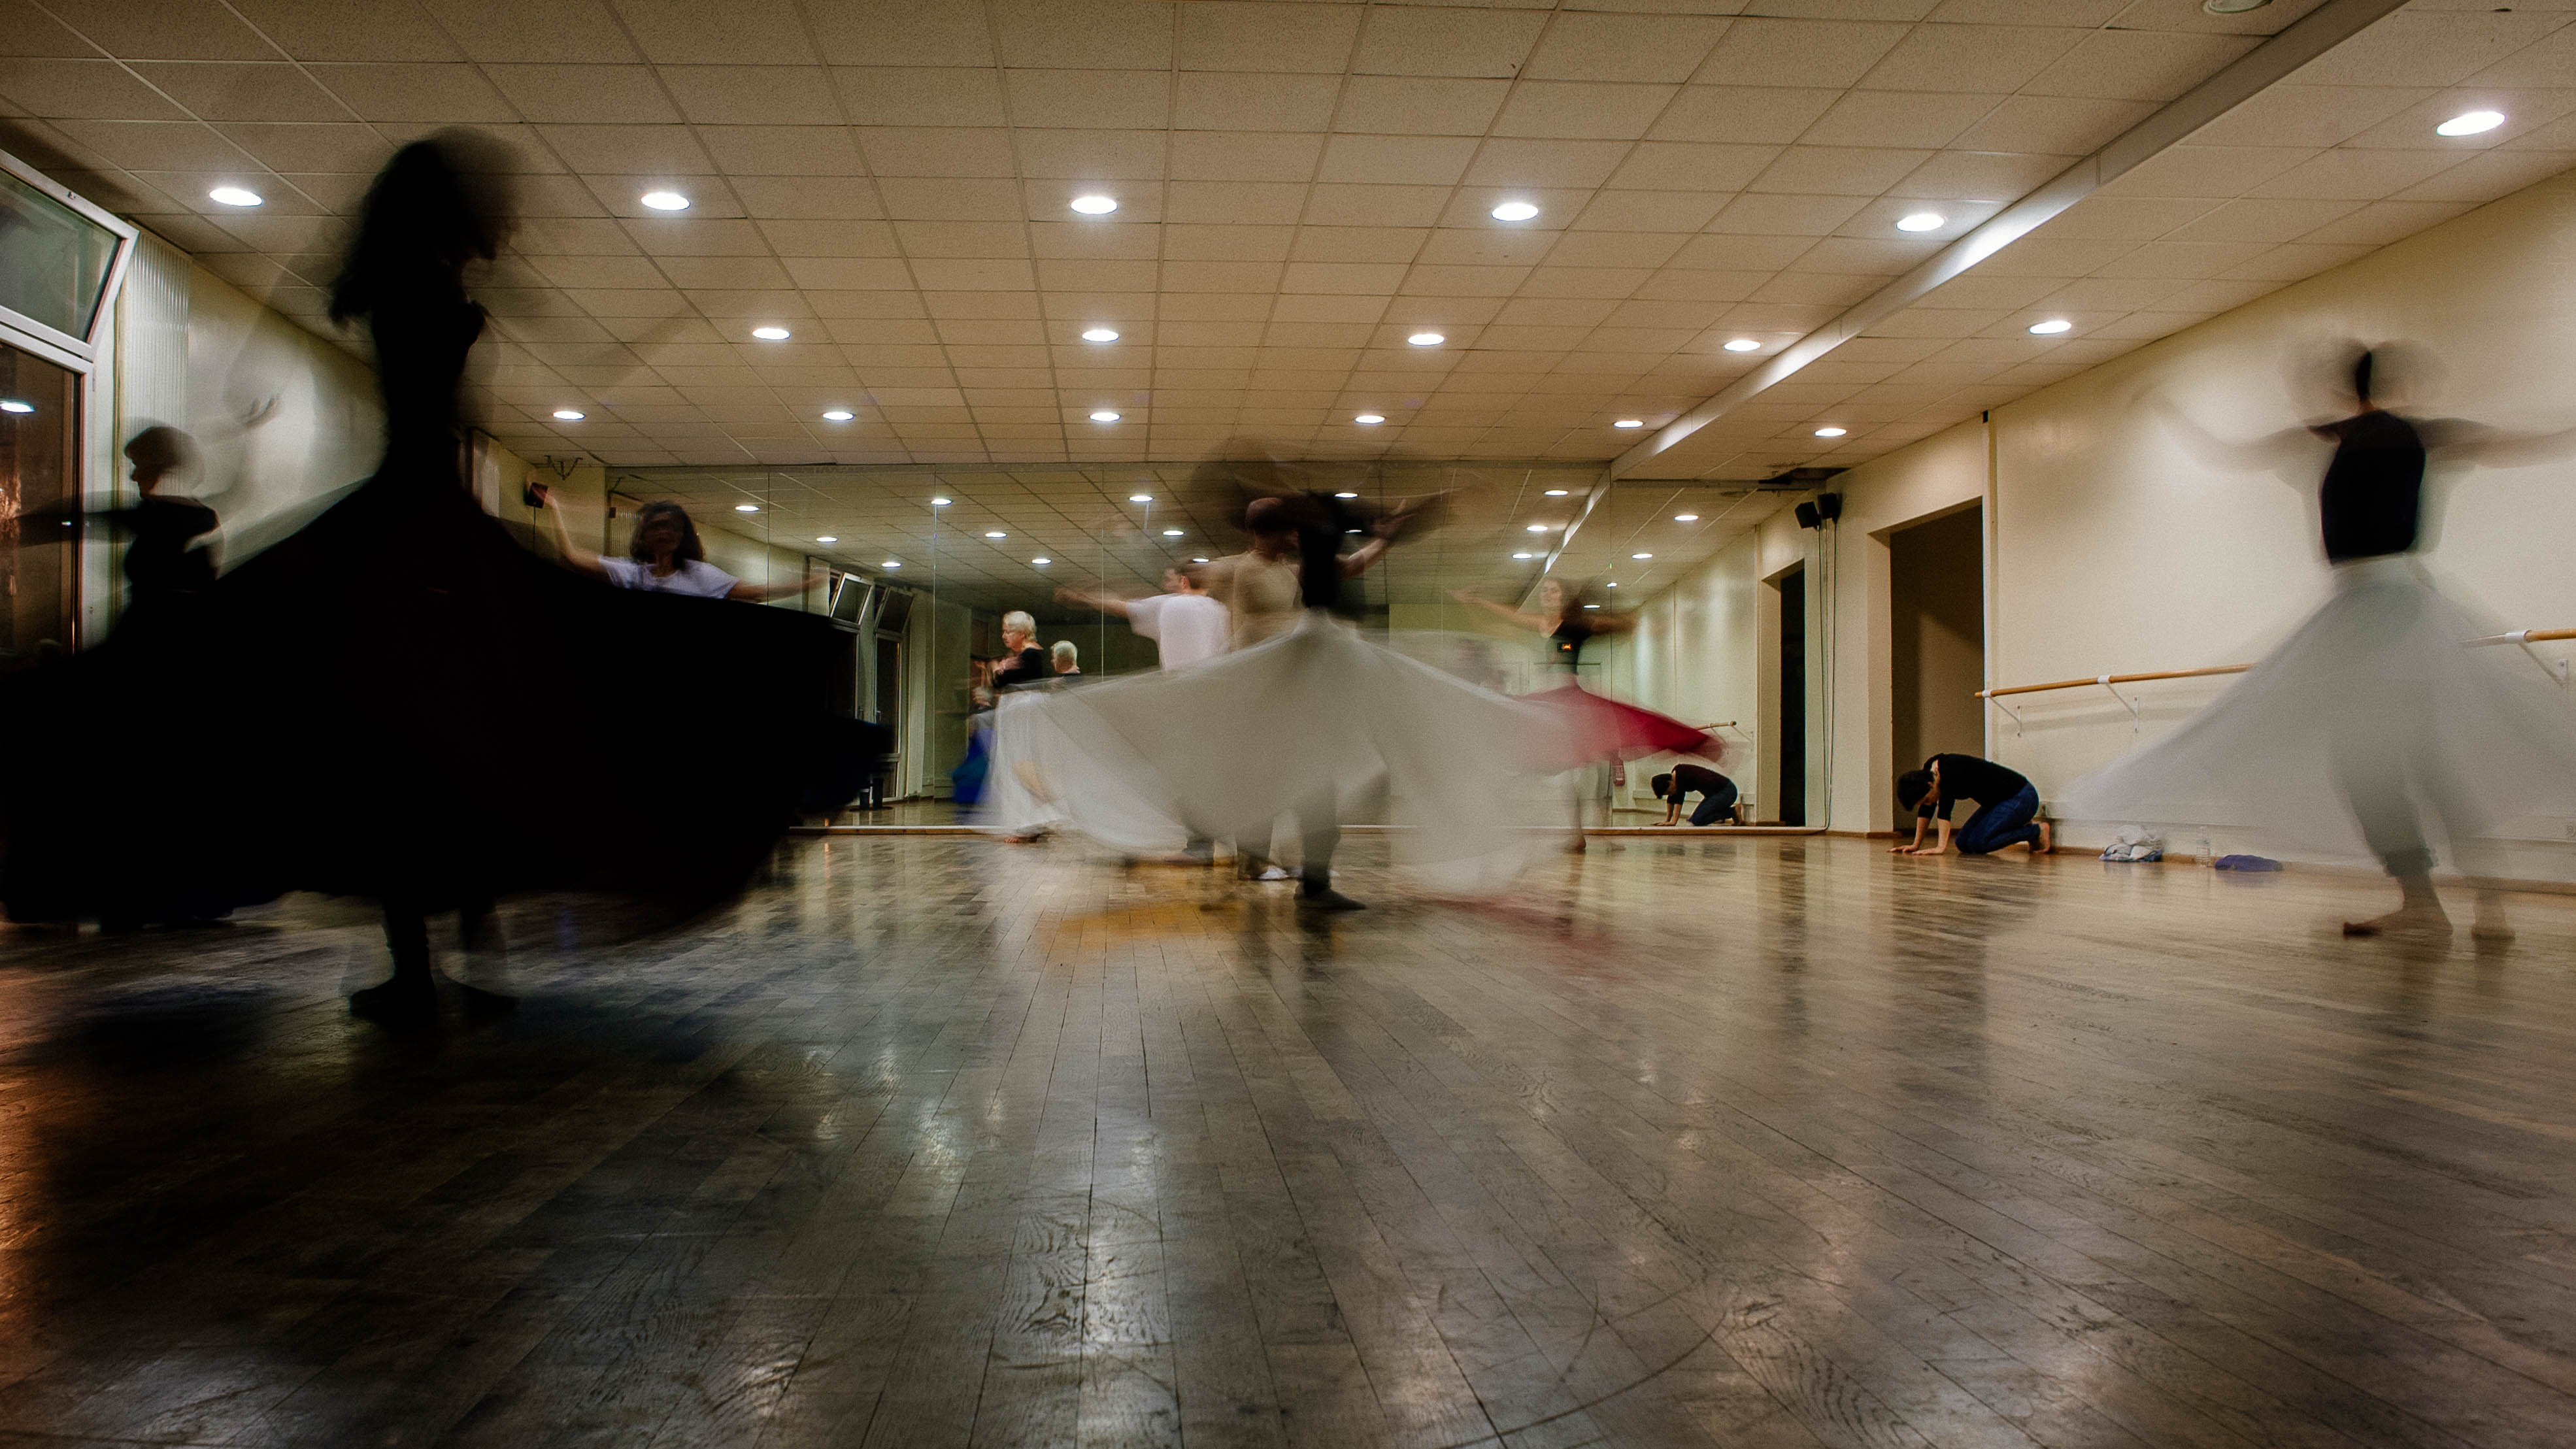 Trans n Dance - Sufi Dance - Transe'En'Danse - Danse Soufi - Rana Gorgani